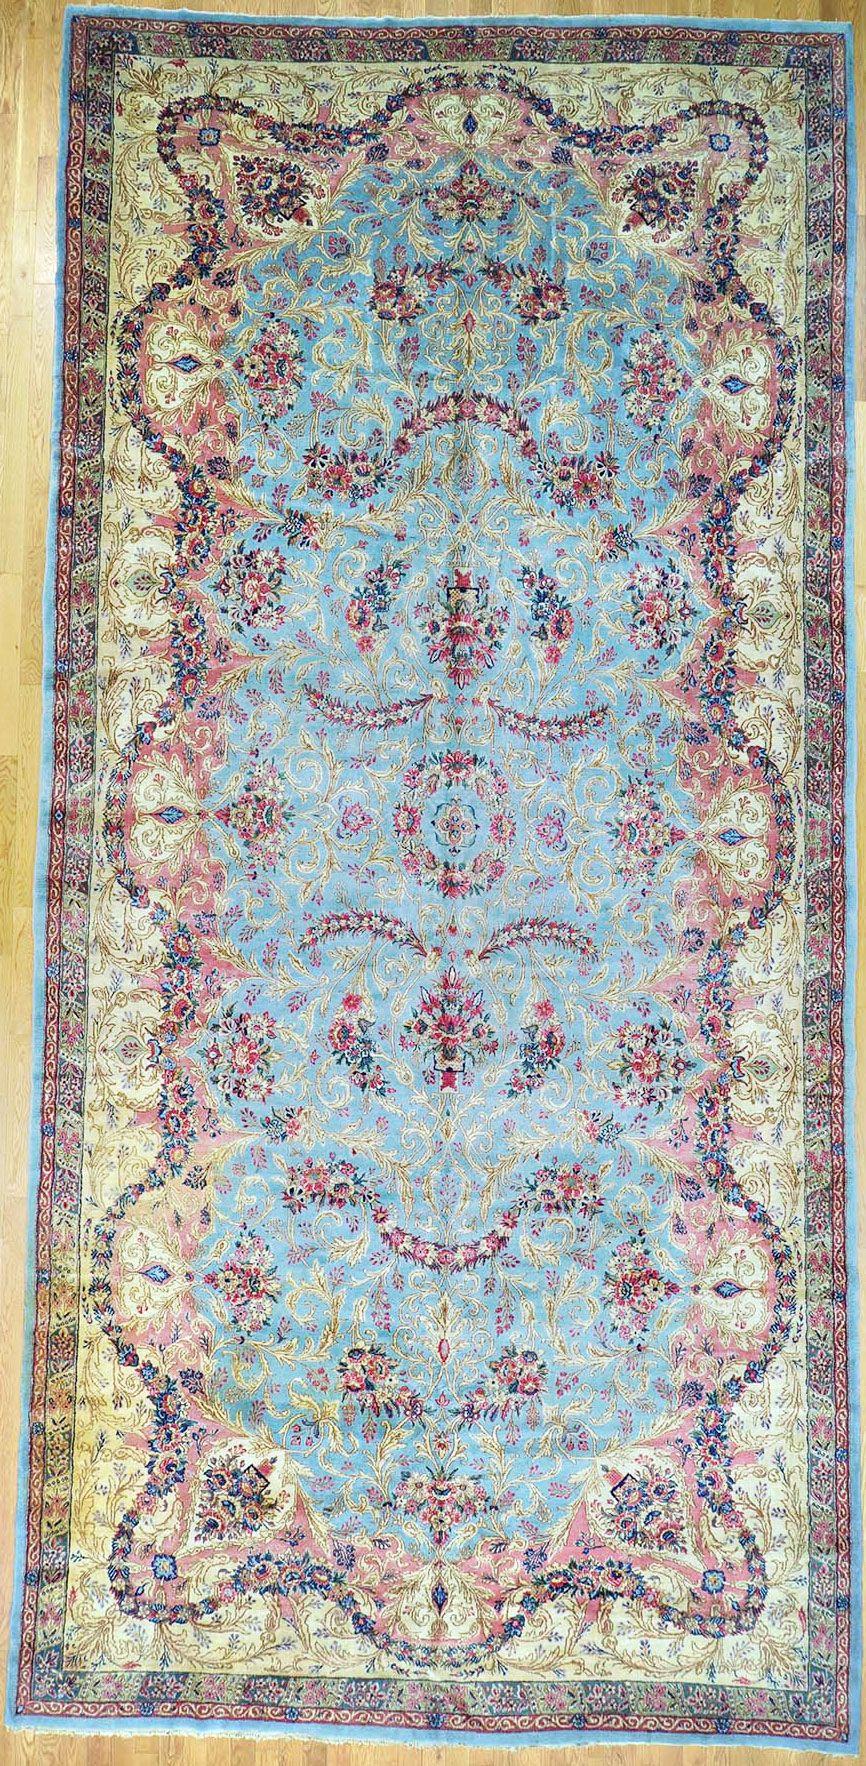 "Kerman Persian Rug - 9' 9"" x 20' 9"" - #kerman #kirman #kermanshah #antiquecarpet #antiquecarpets #antiquerug #antiquerugs #carpets #handknotted #handknottedrug #handmade #iran #iranianrug #oldcarpet #orientalcarpet #orientalcarpets #orientalrug #orientalrugs #persiancarpet #persiancarpets #persianrug"